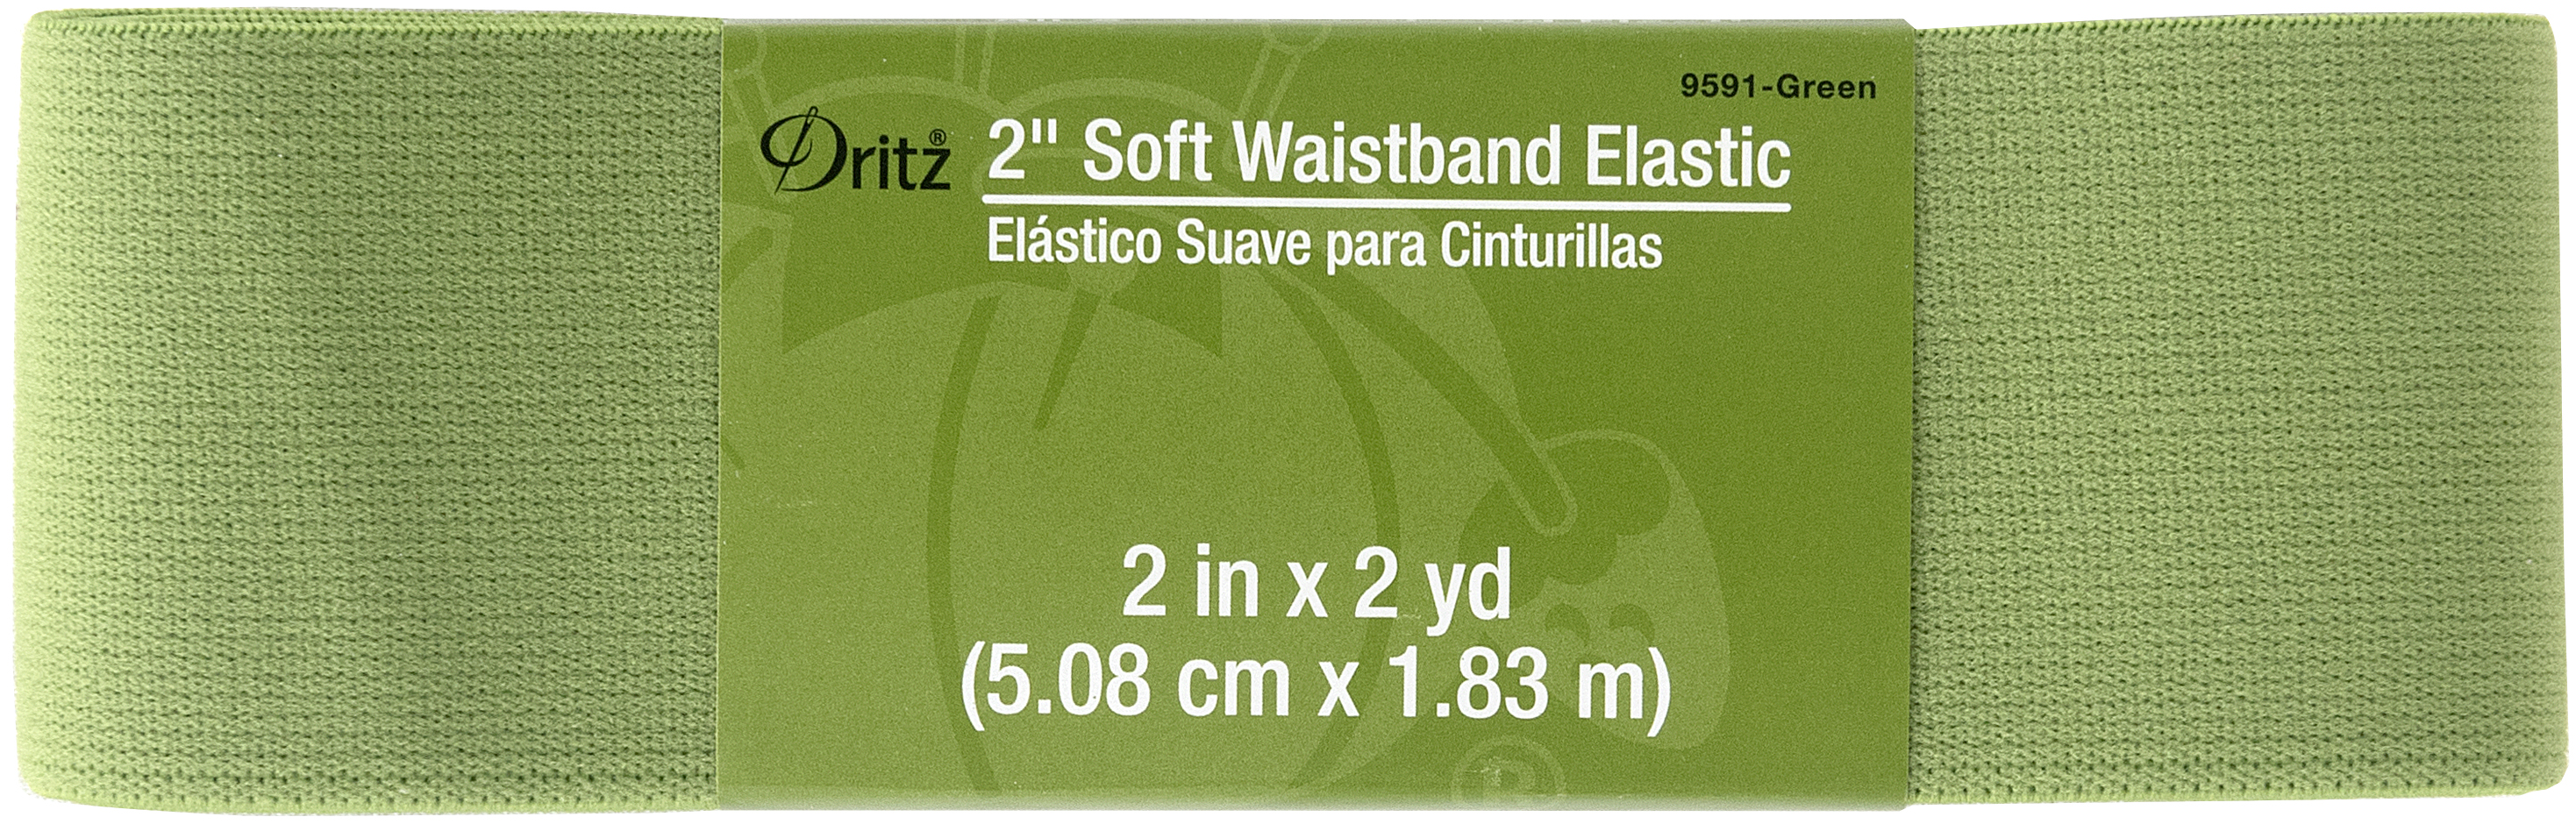 2in x 2yd Soft Waistband Elastic Green